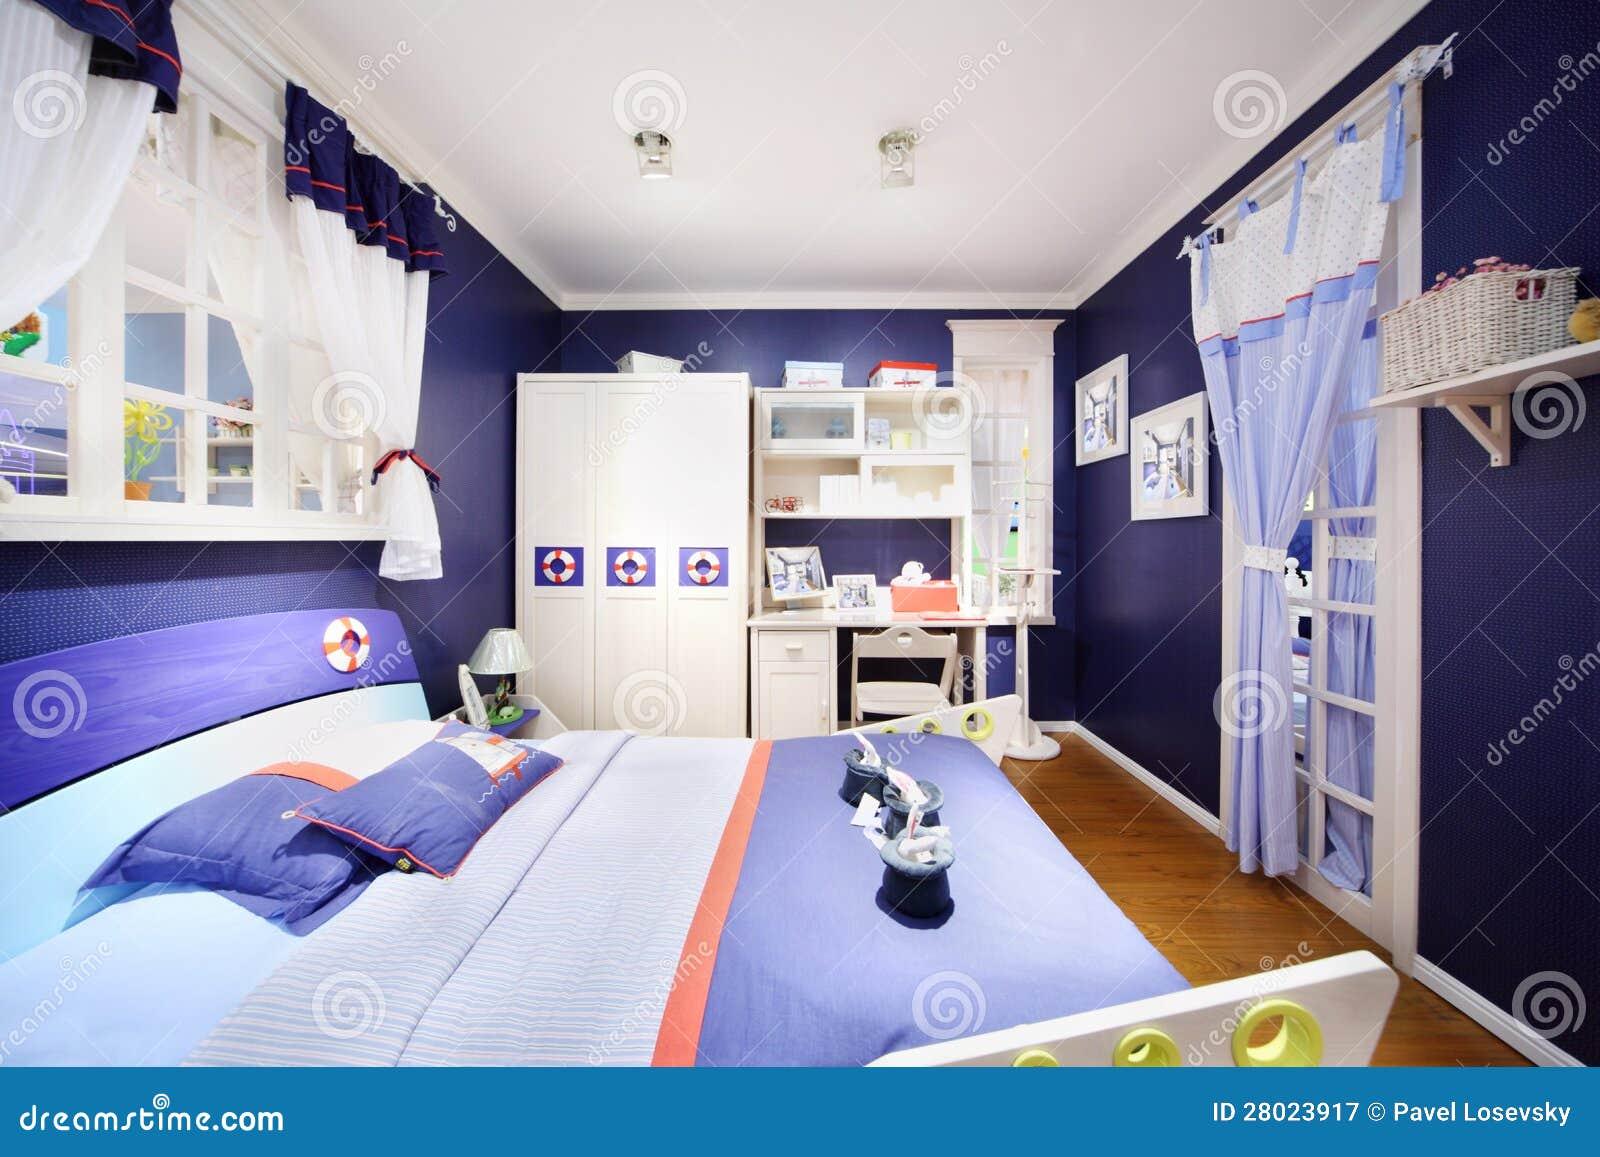 Stor blå sängkläder i sovrum arkivfoto   bild: 52653746